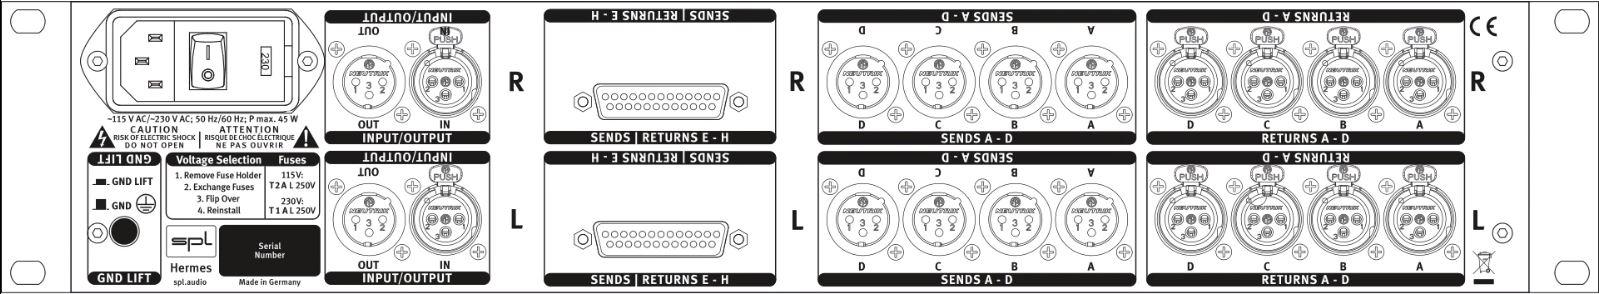 SPL Hermes MAstering Router Rueckseite